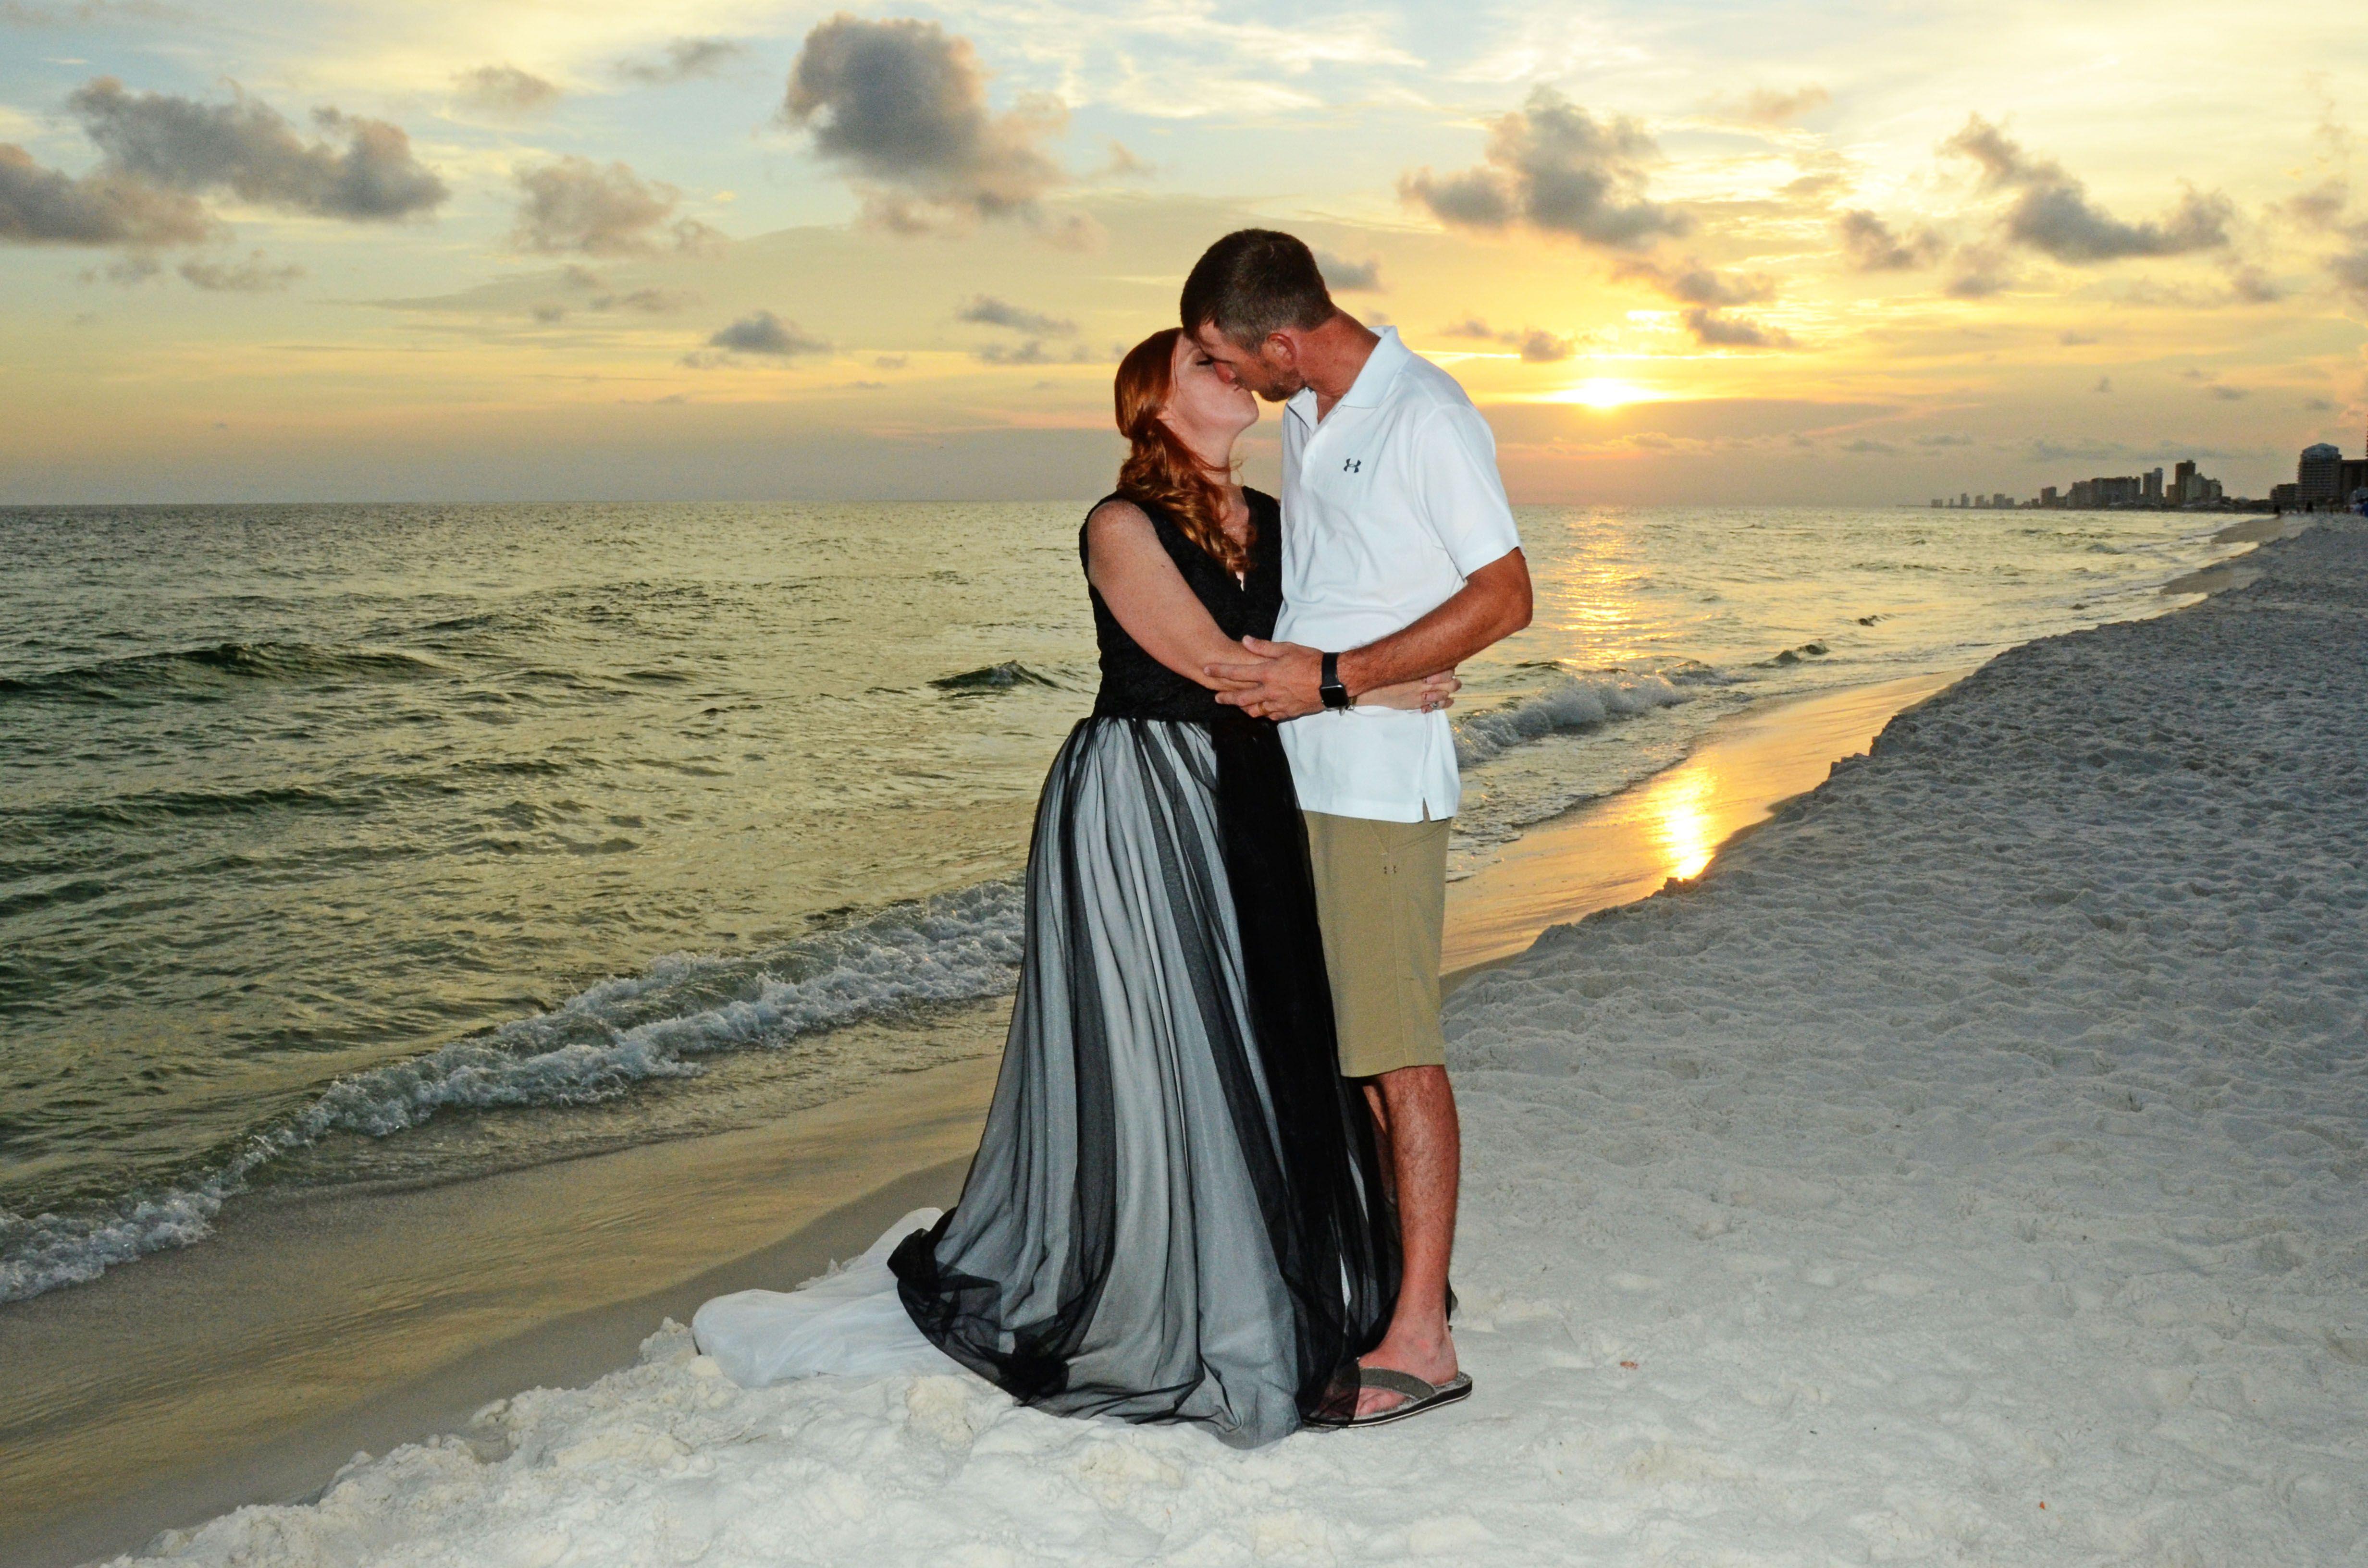 Panama City Beach, Florida destination beach wedding (With